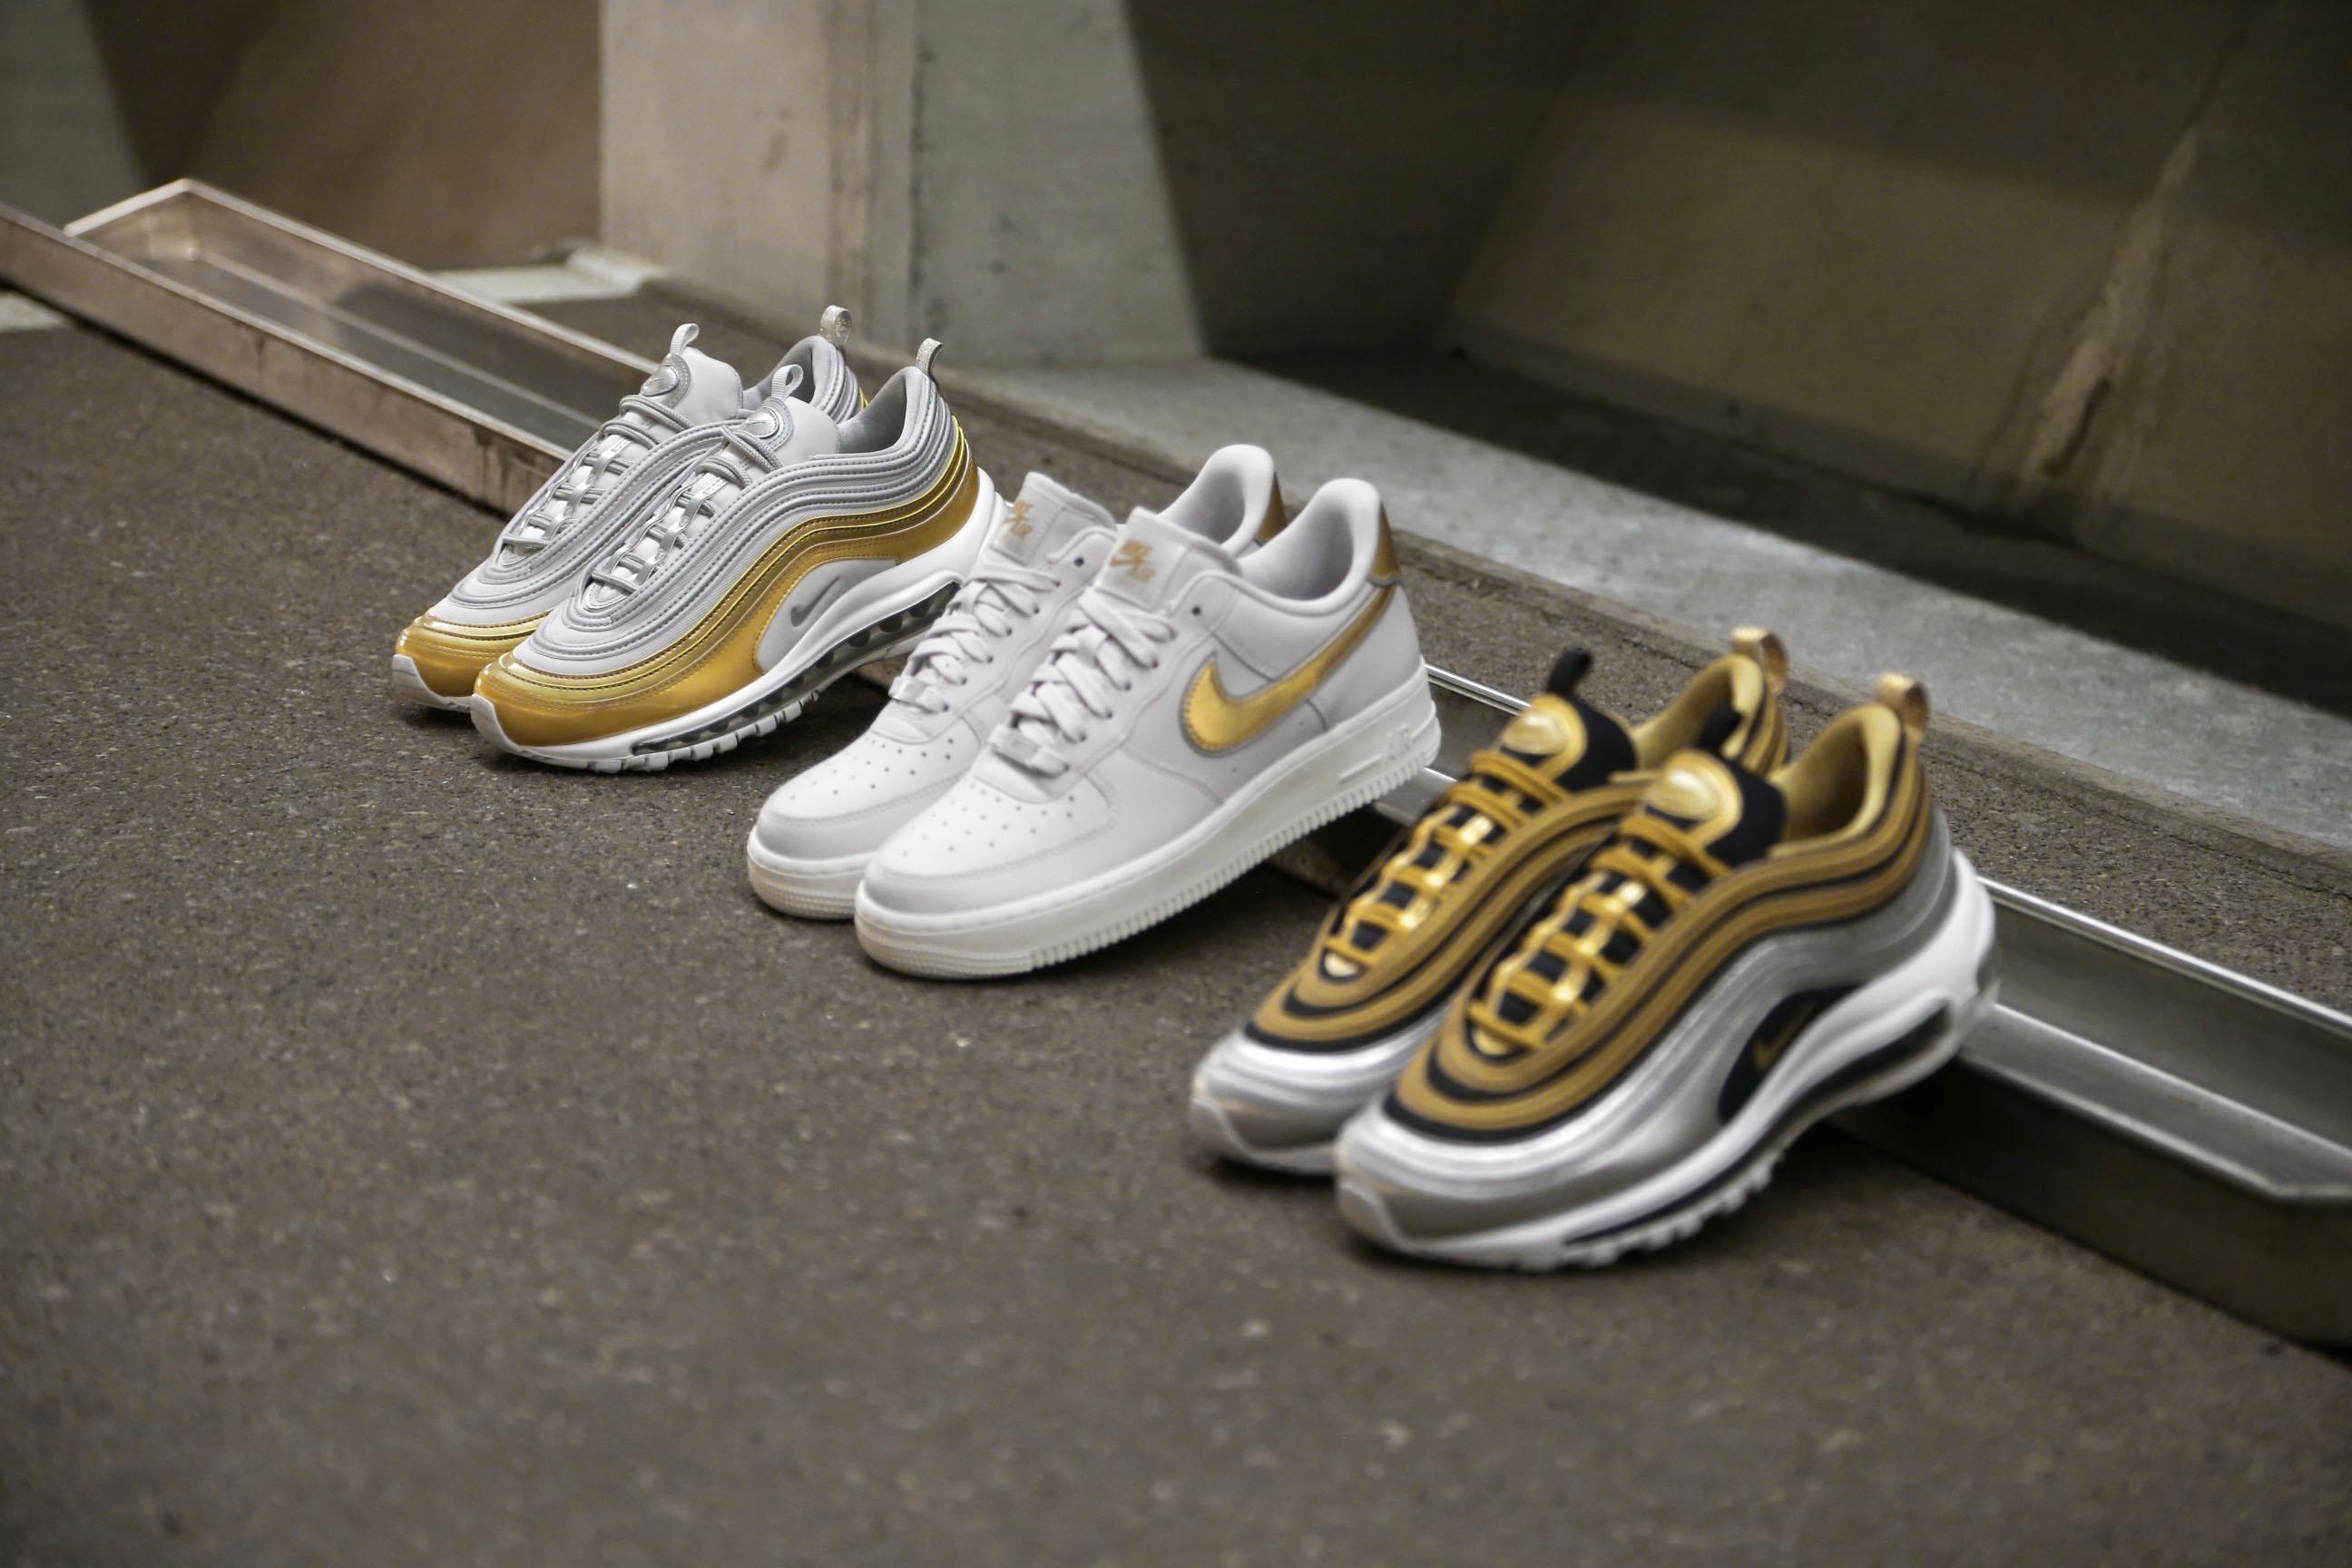 Nike W Air Max 97 SE Metallic Vast Grey Metallic Gold Summit